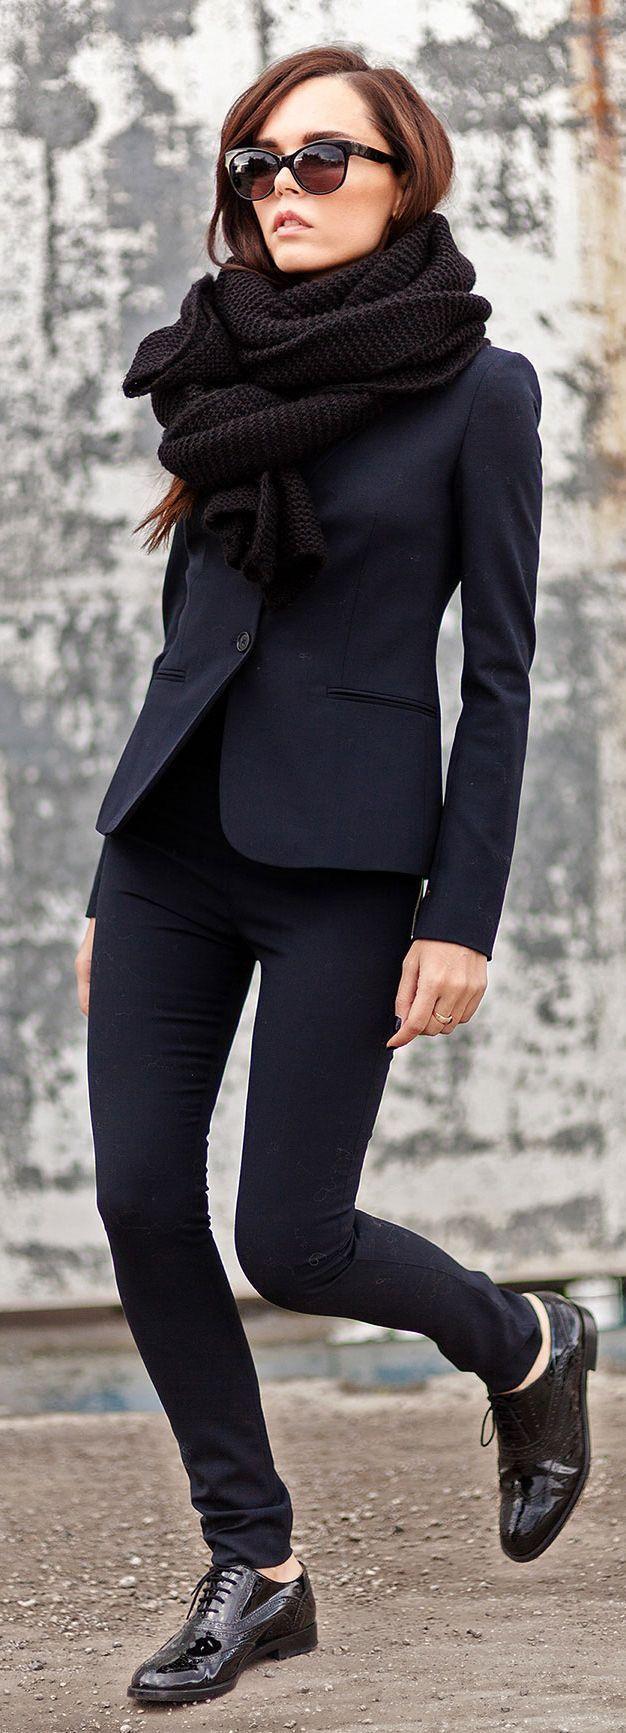 Women's fashion | Elegant blazer and scarf